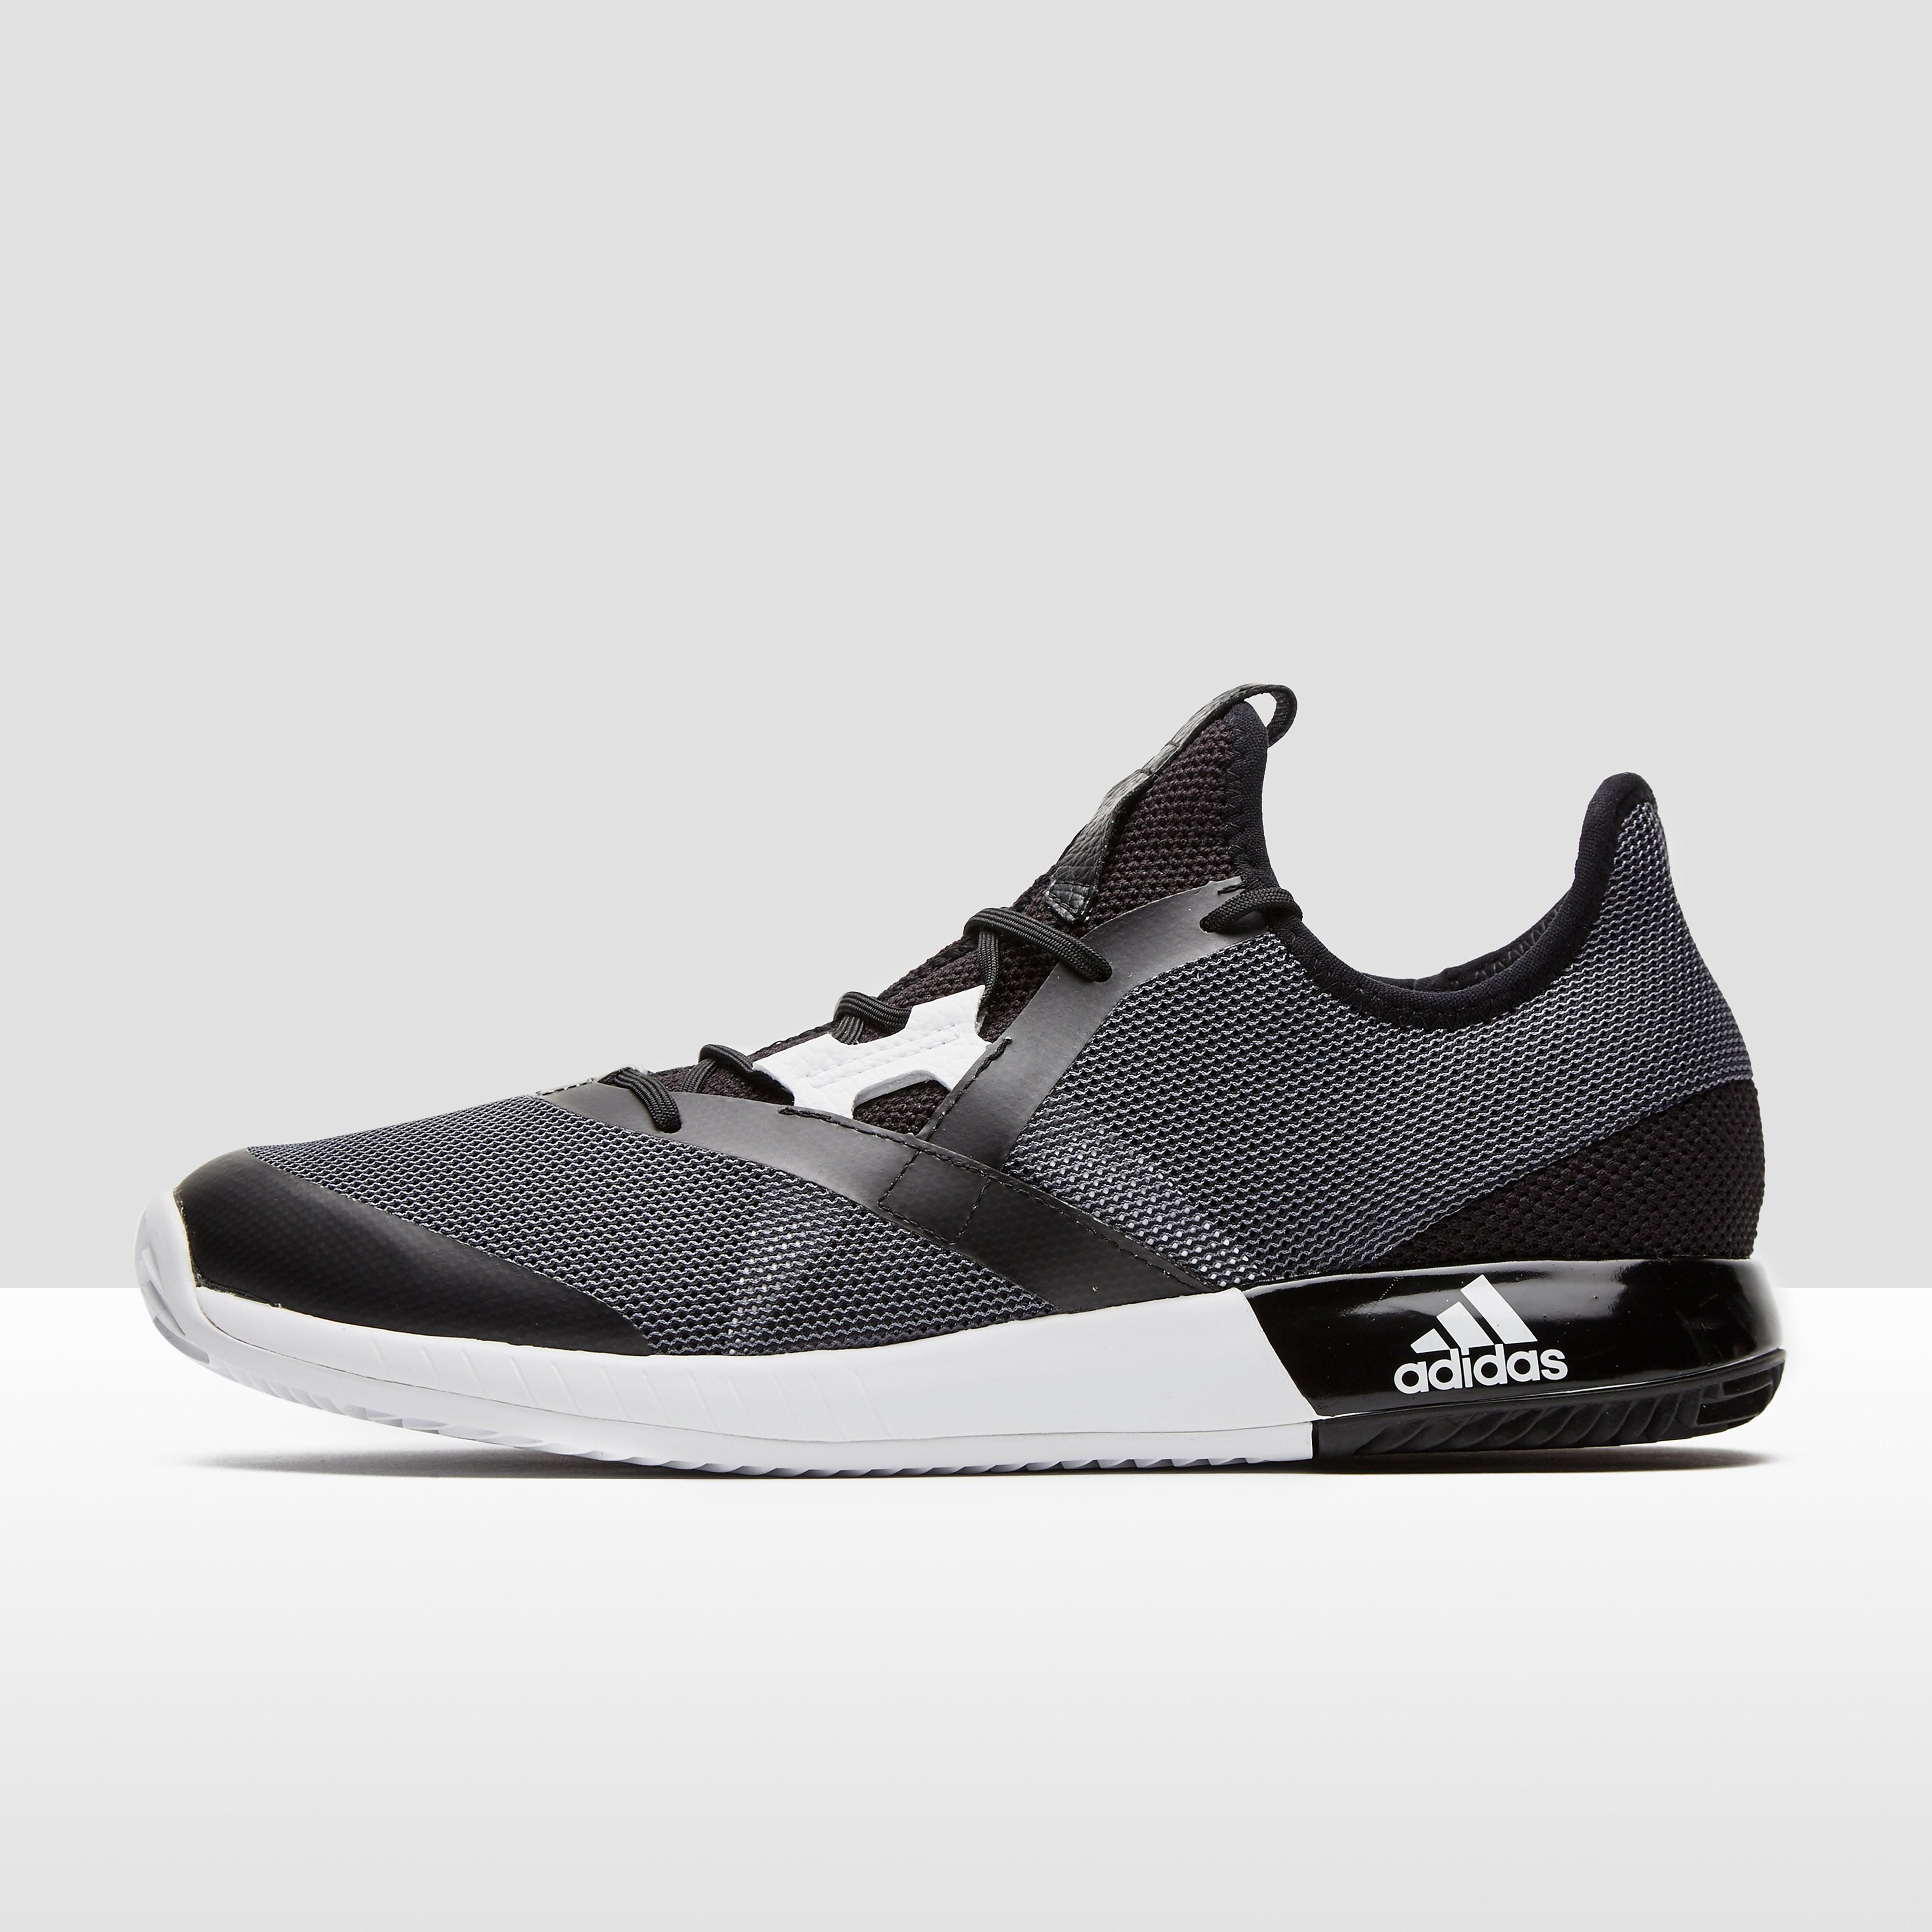 adidas Adizero Defiant Bounce Men's Tennis Shoes